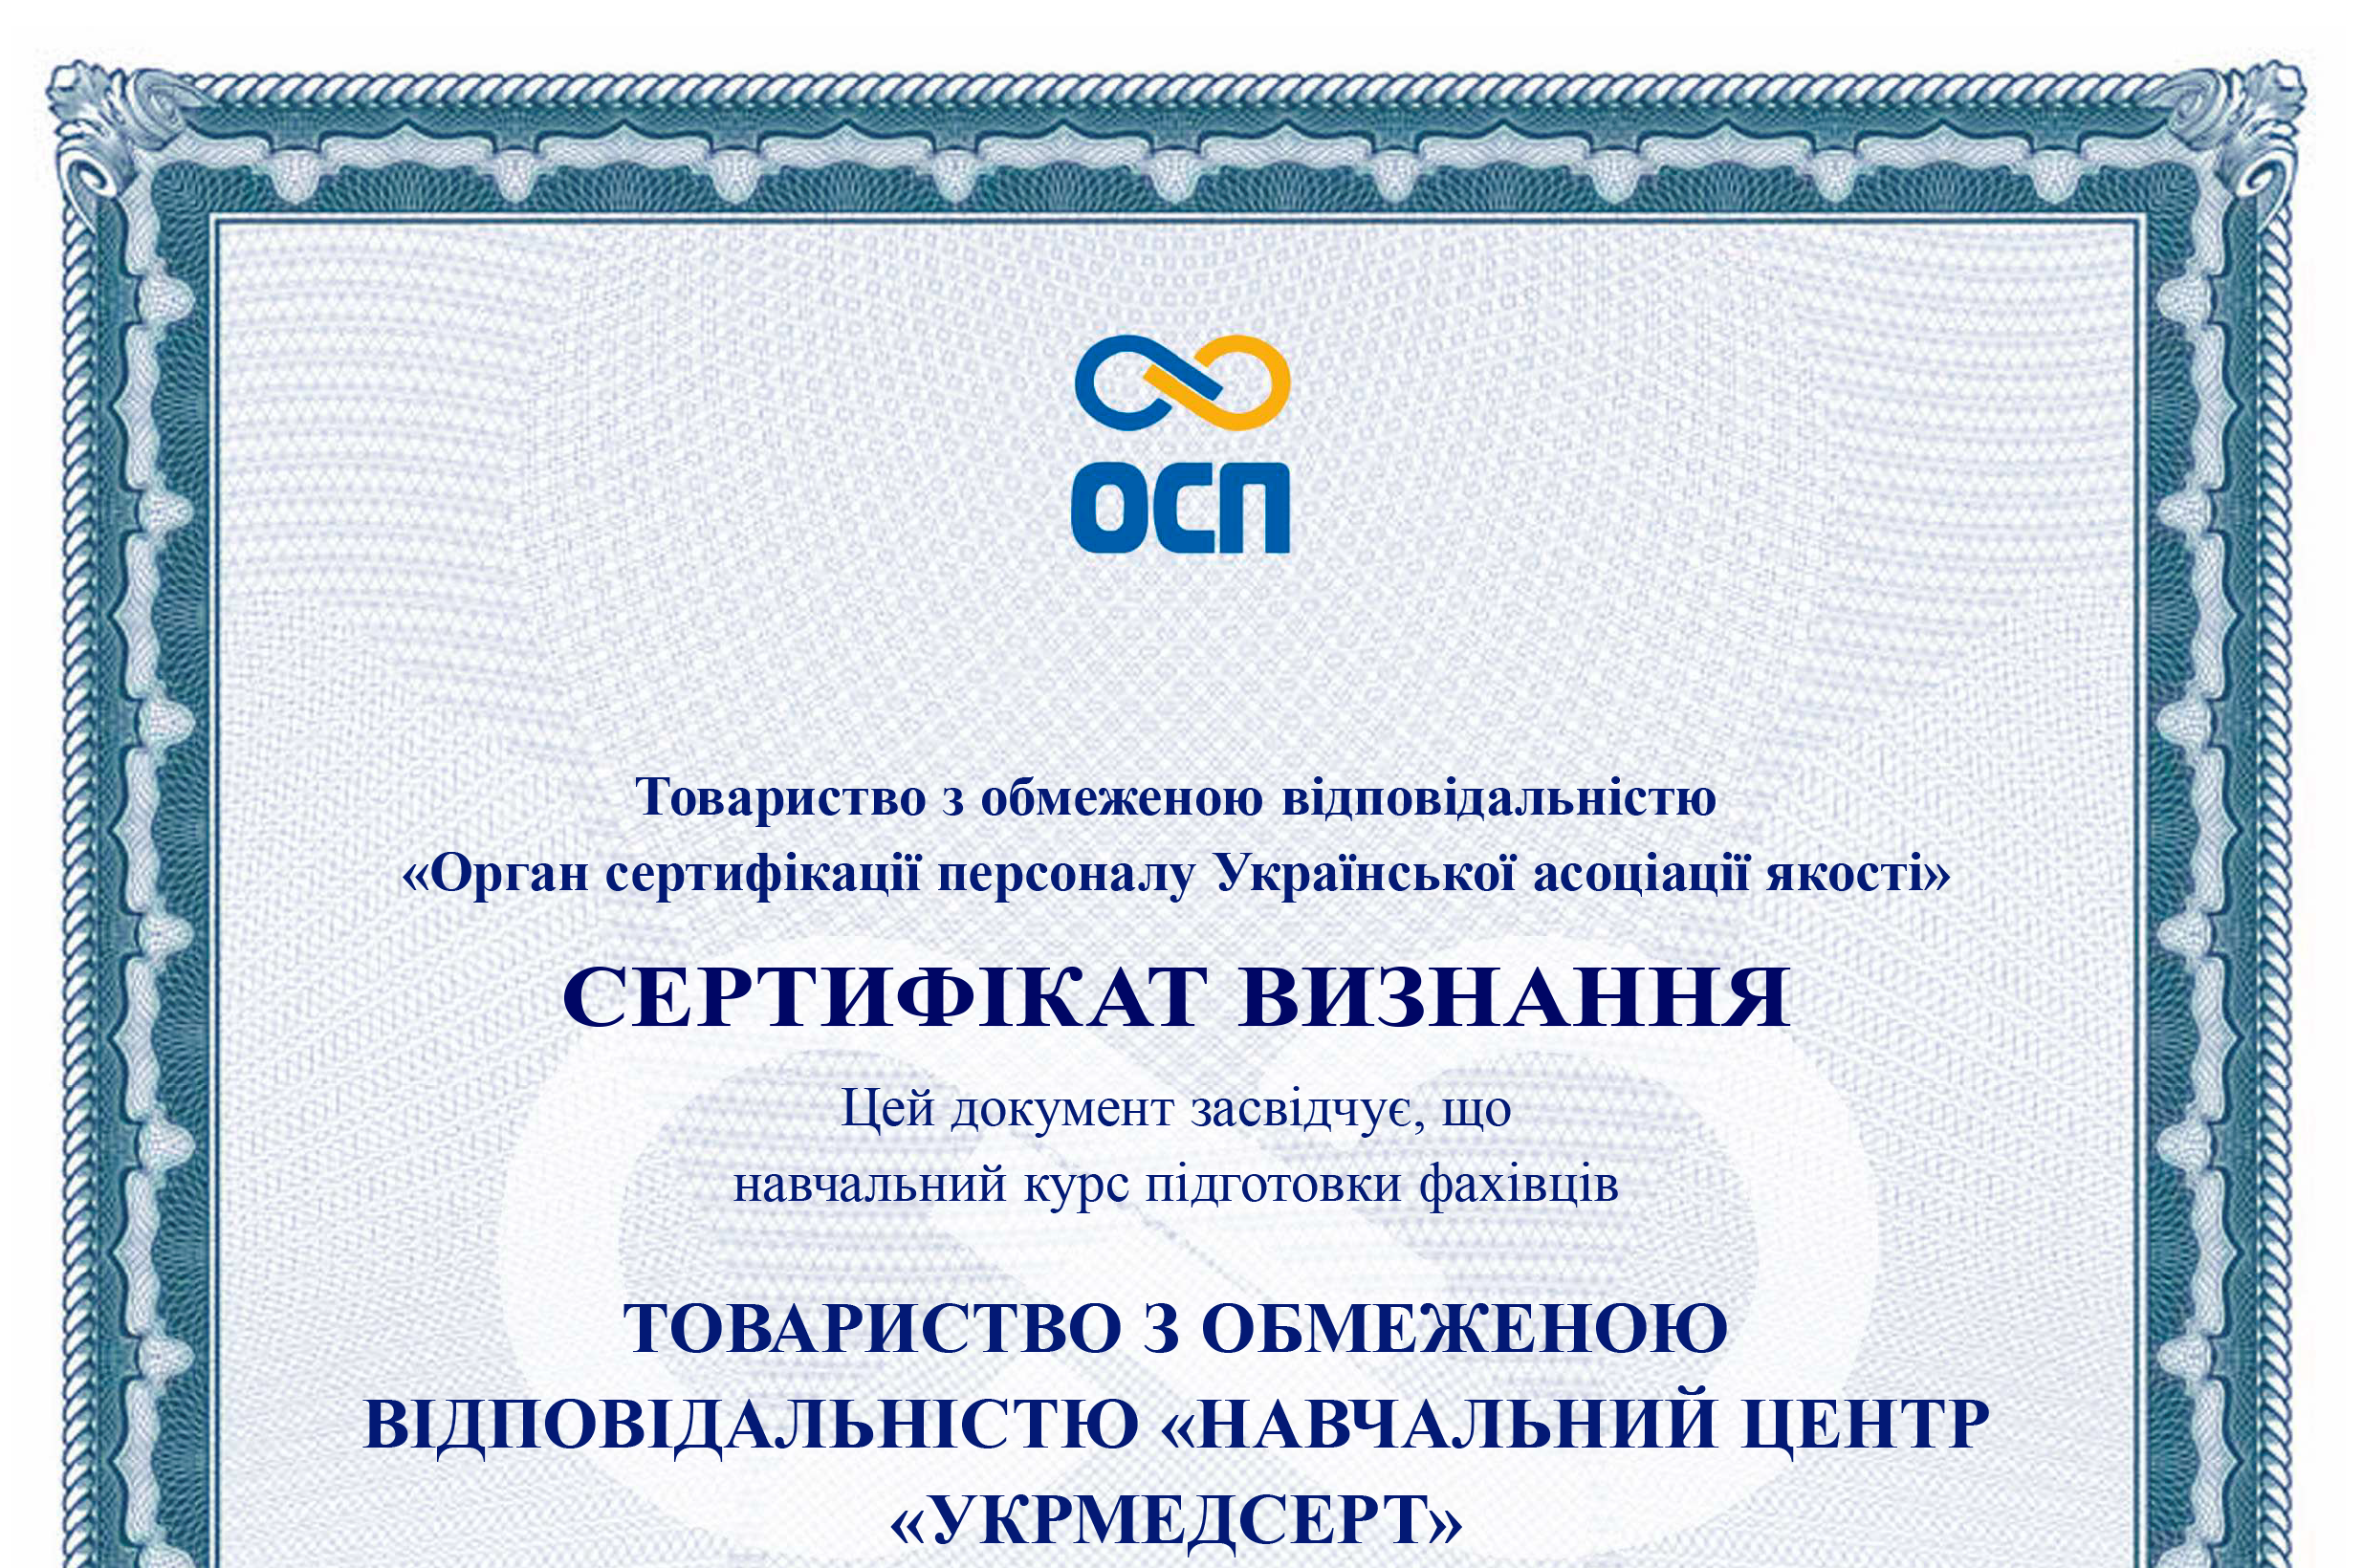 НЦ Укрмедсерт 13485 3